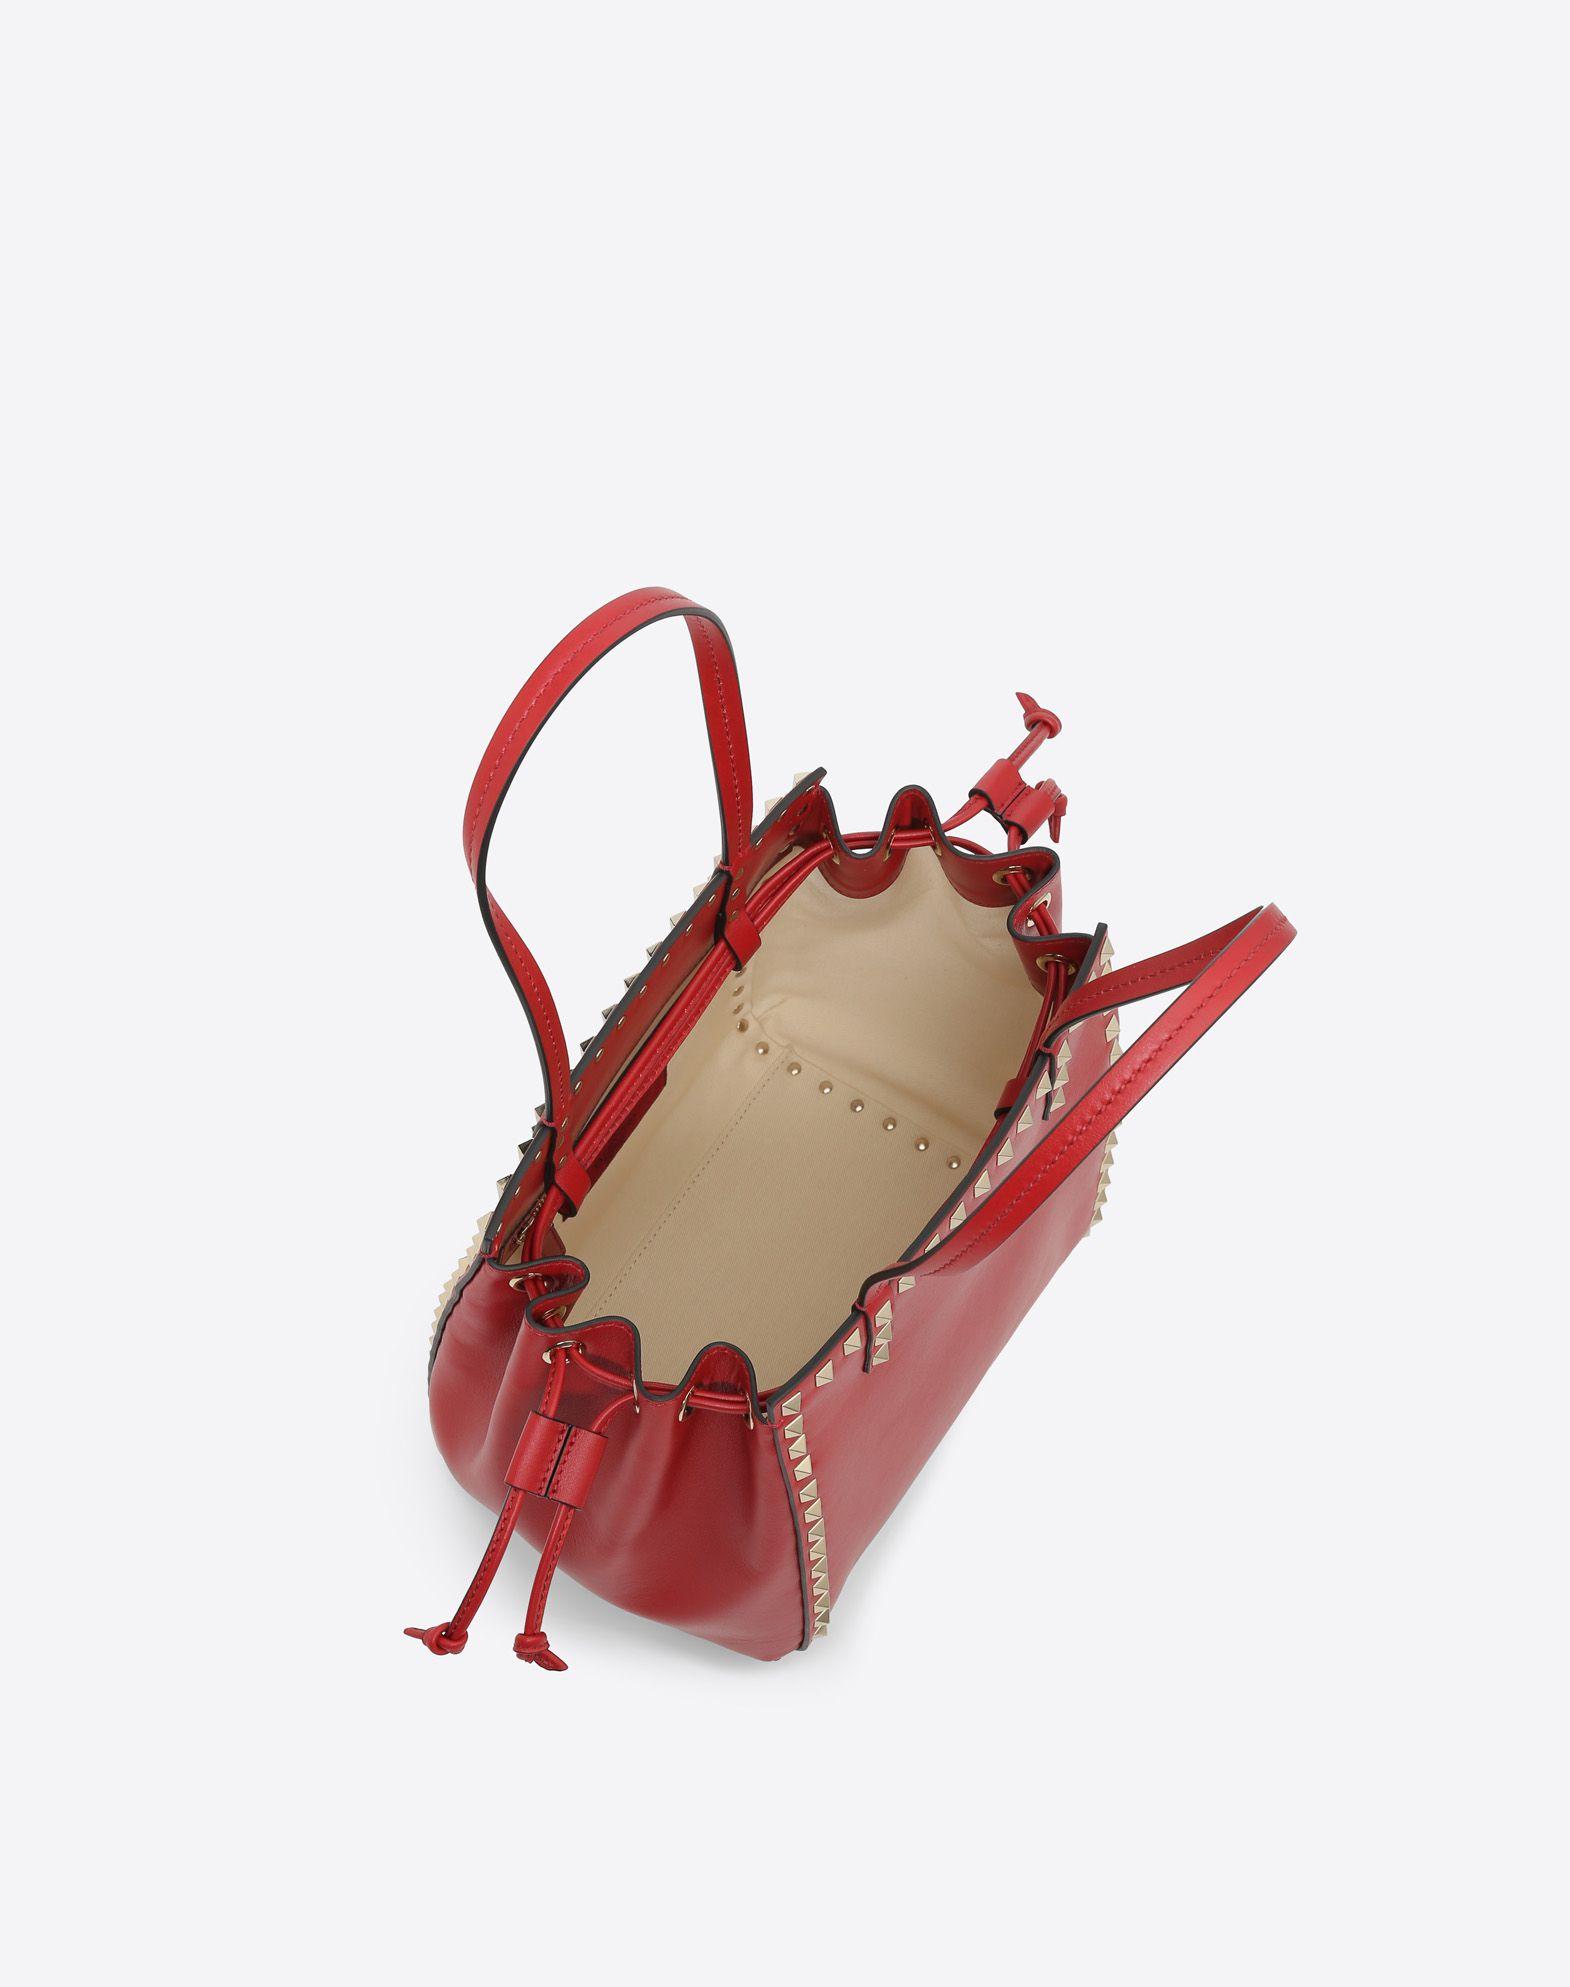 VALENTINO GARAVANI Rockstud Small Double handle Bag HANDBAG D e